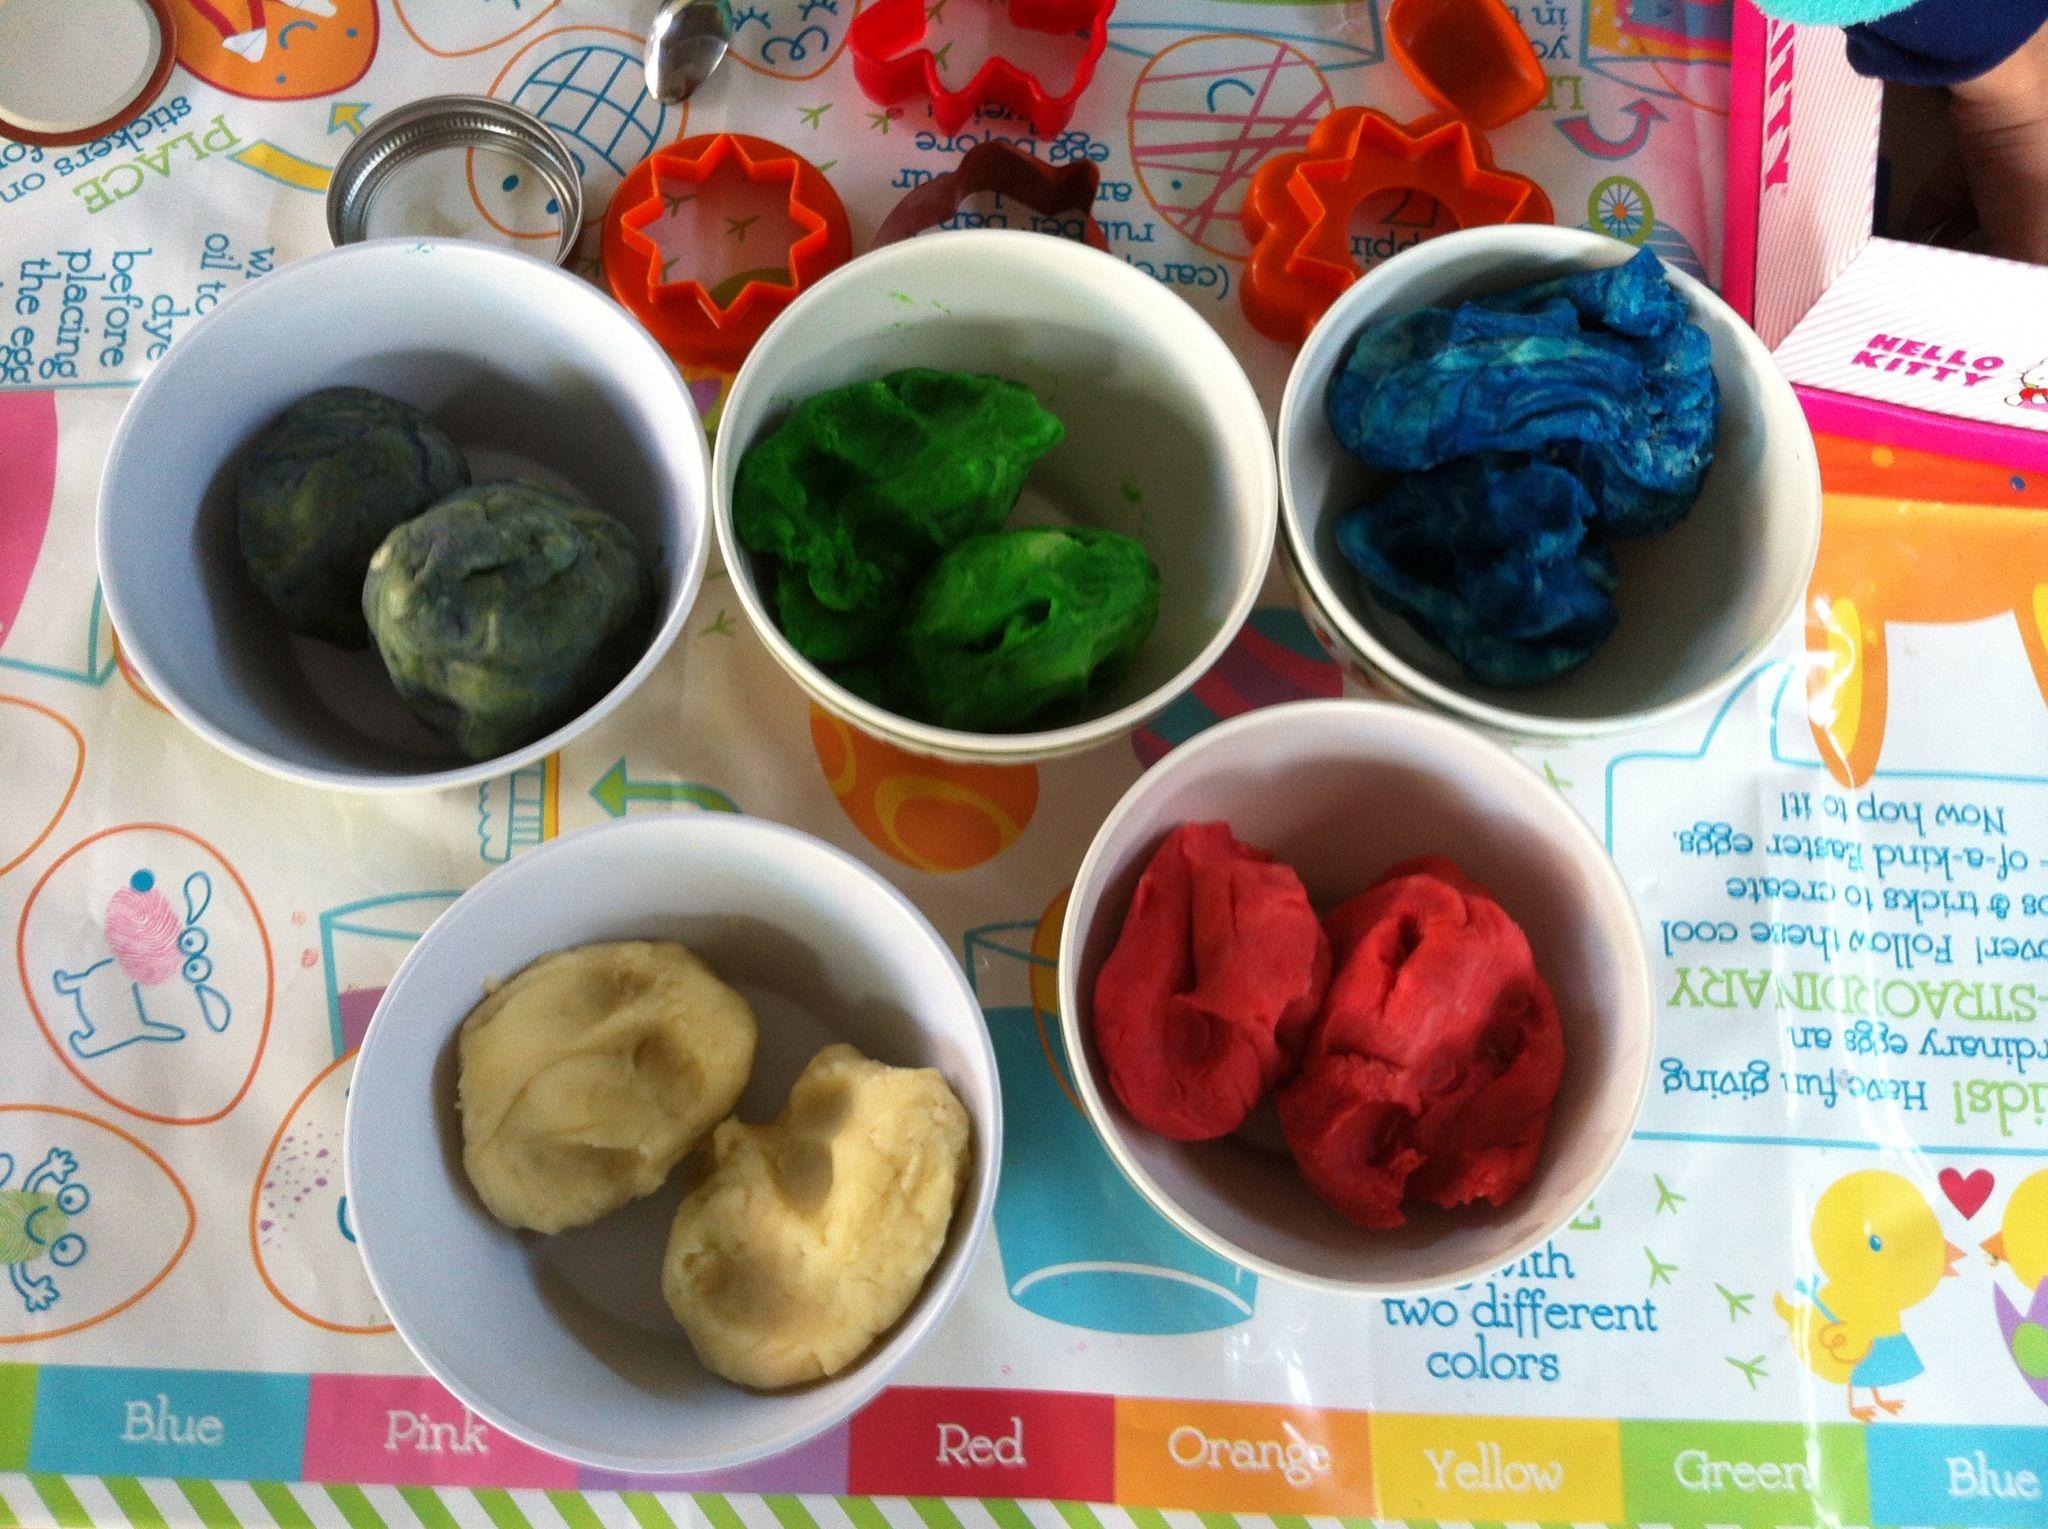 DIY playdough..... 4 cups water, 4 cups flour, 1 cup salt